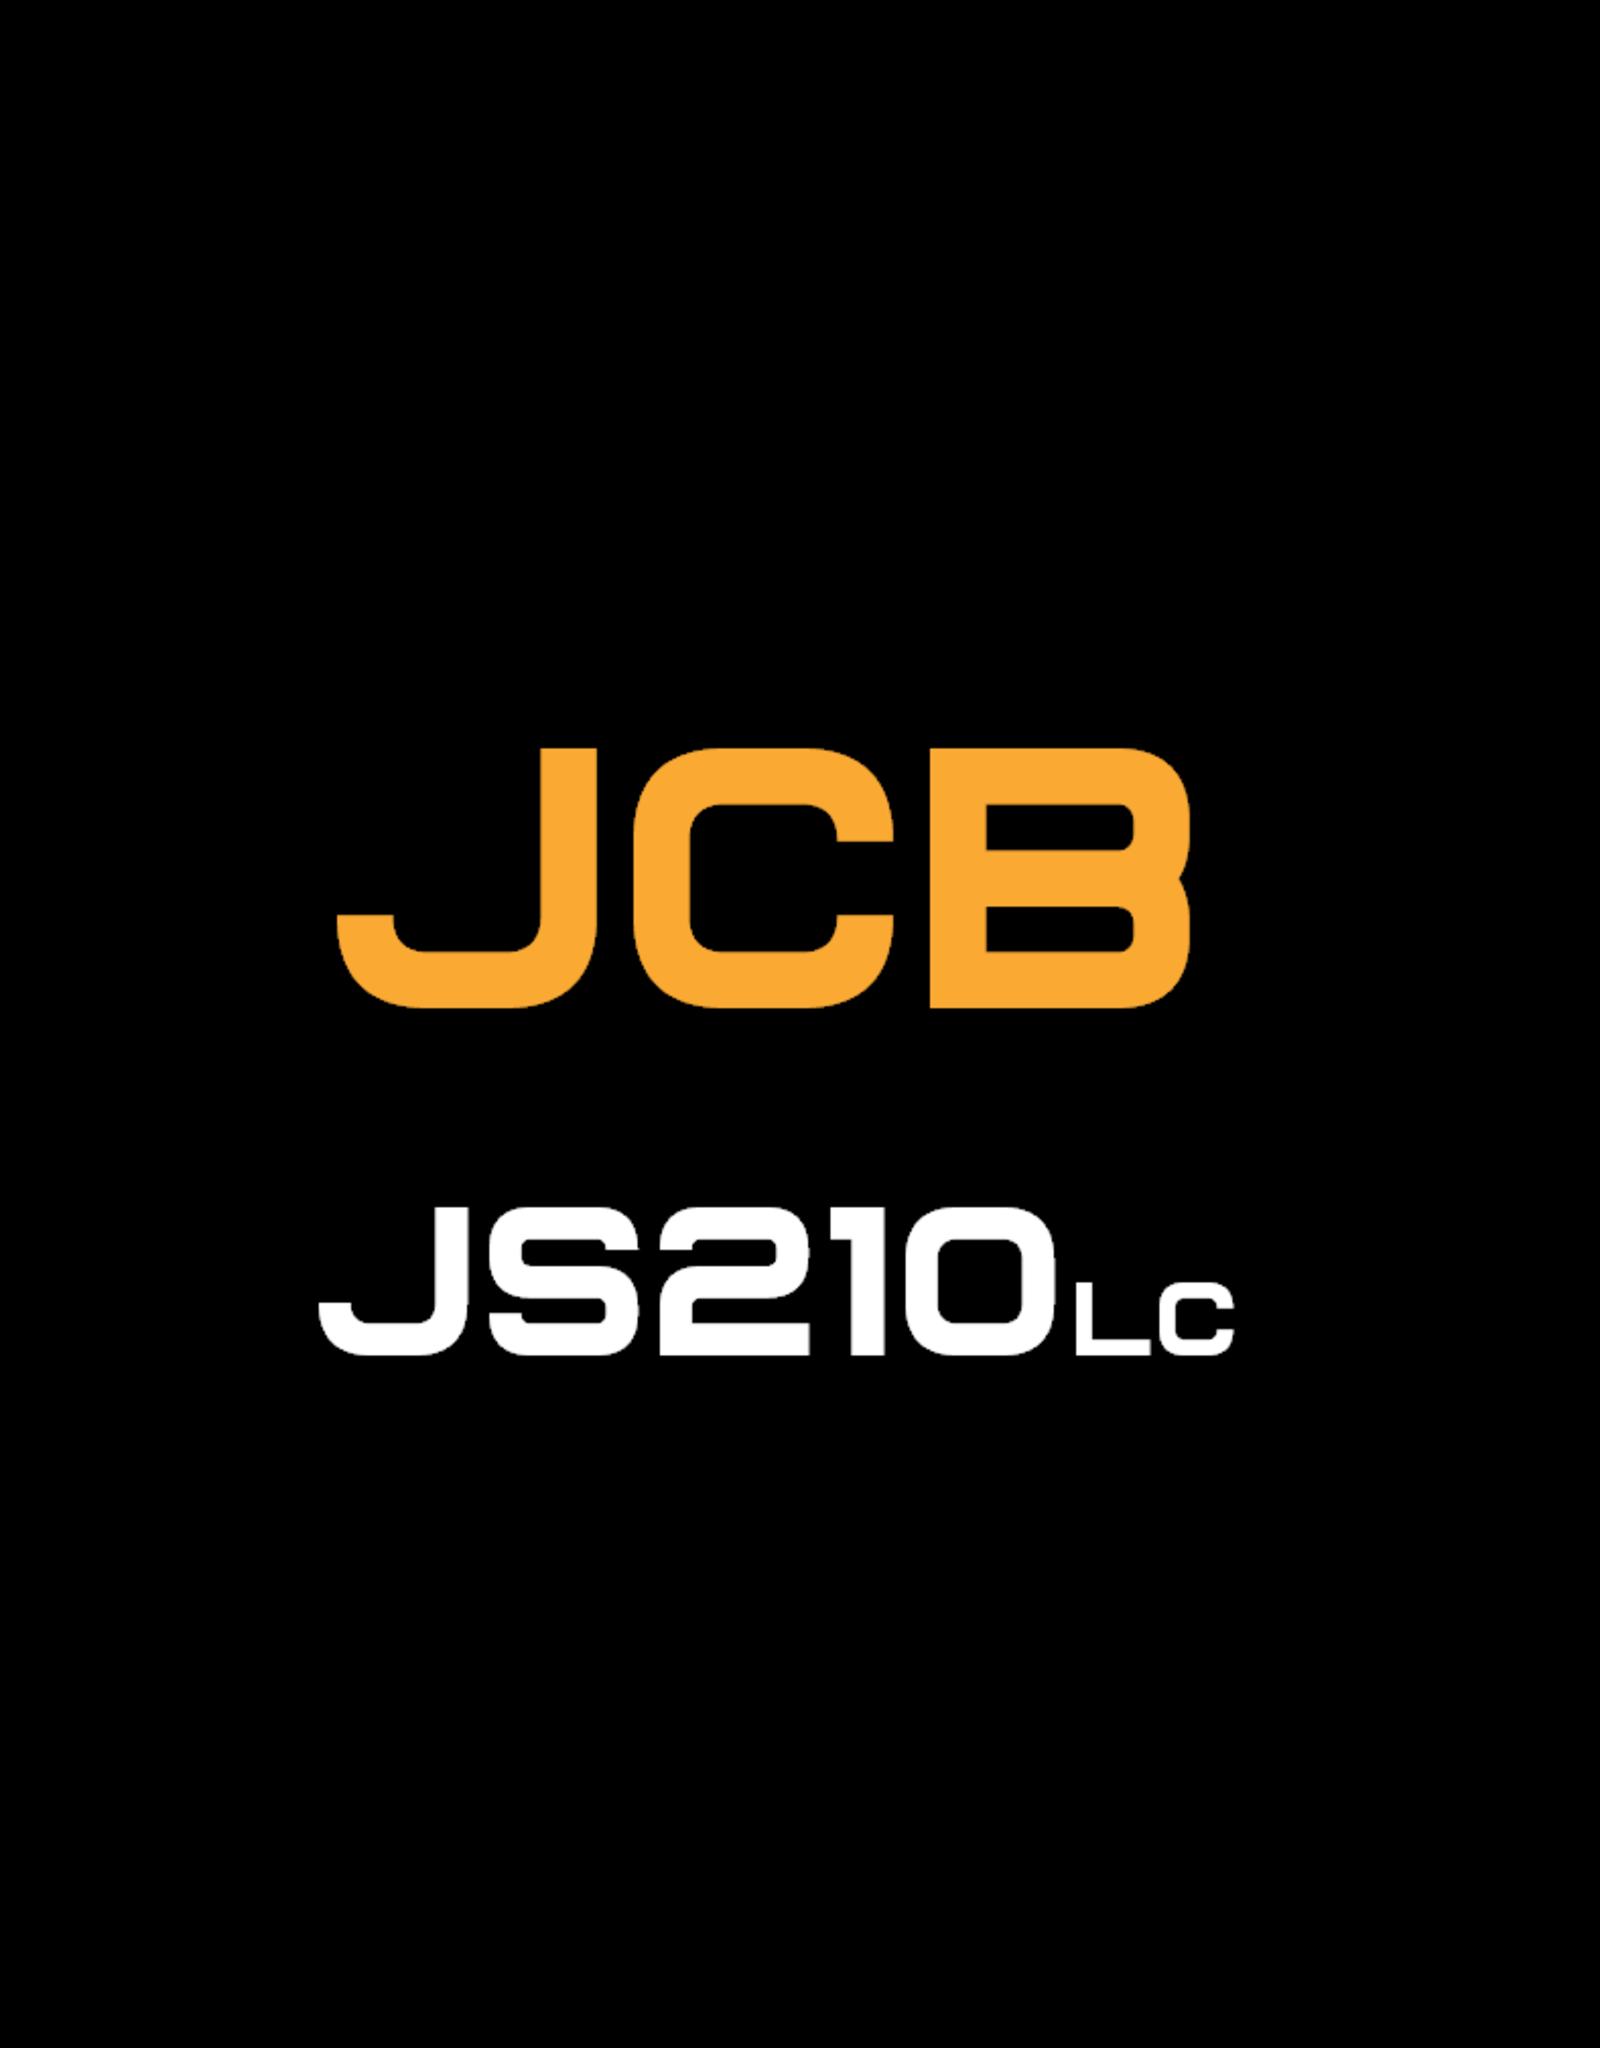 Echle Hartstahl GmbH FOPS for JCB JS210LC